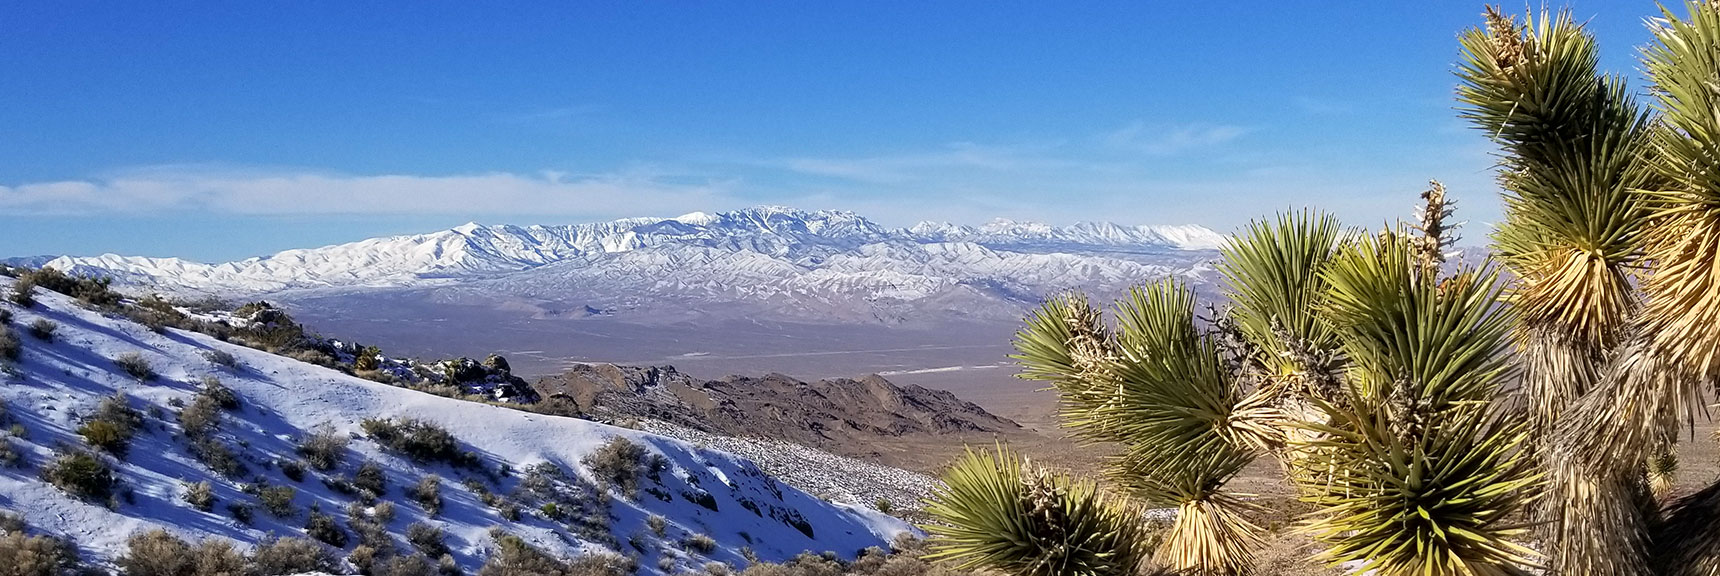 Mt Charleston Wilderness from North Side of Gass Peak, Nevada